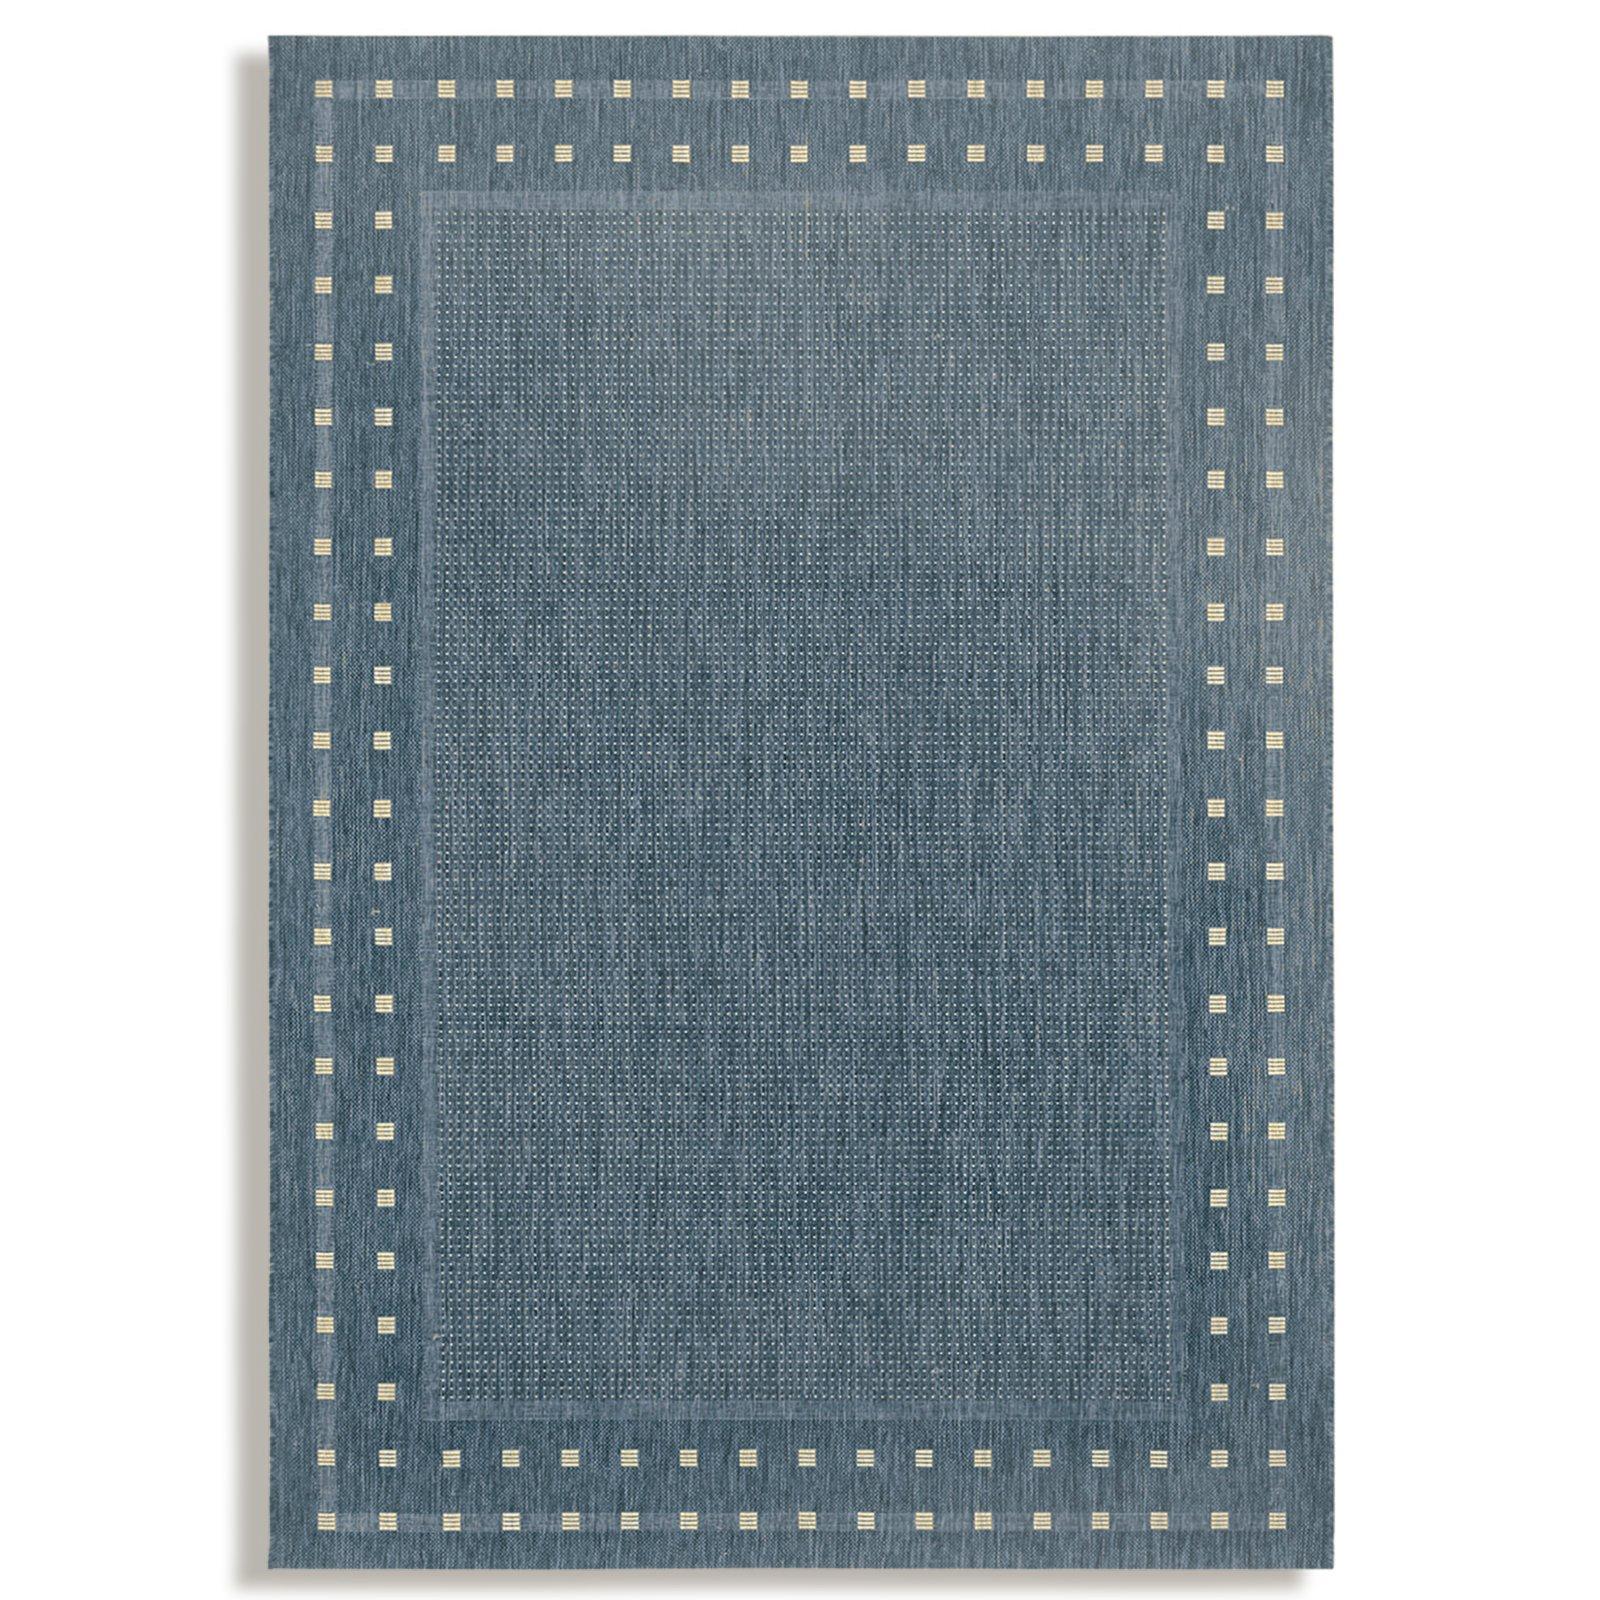 Teppich OSLO  blaugrau  80×340 cm  Gemusterte Teppiche